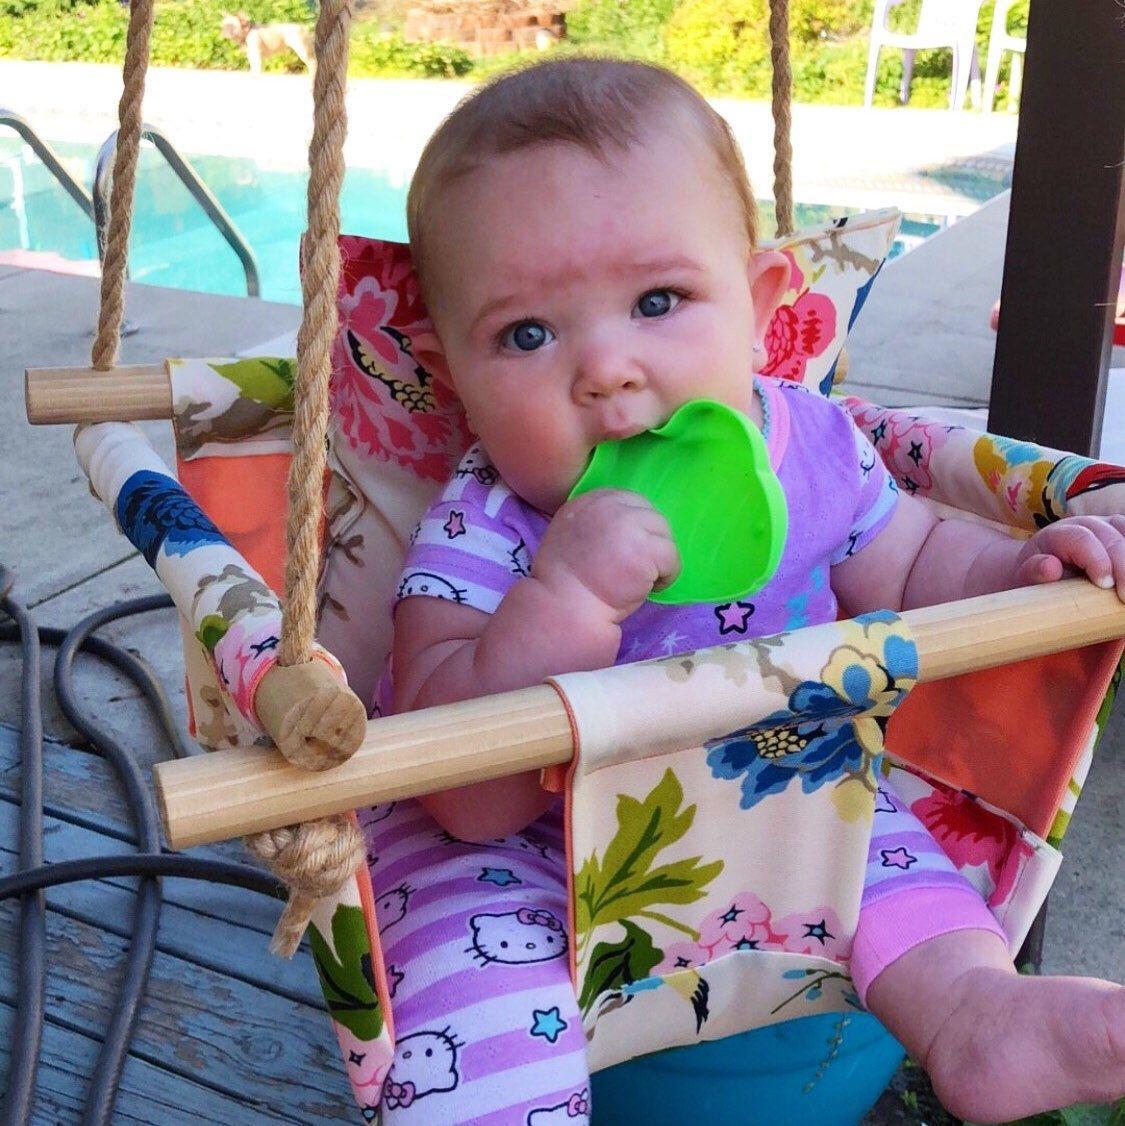 Indooroutdoor baby swing bird fabric baby swing nursery decor